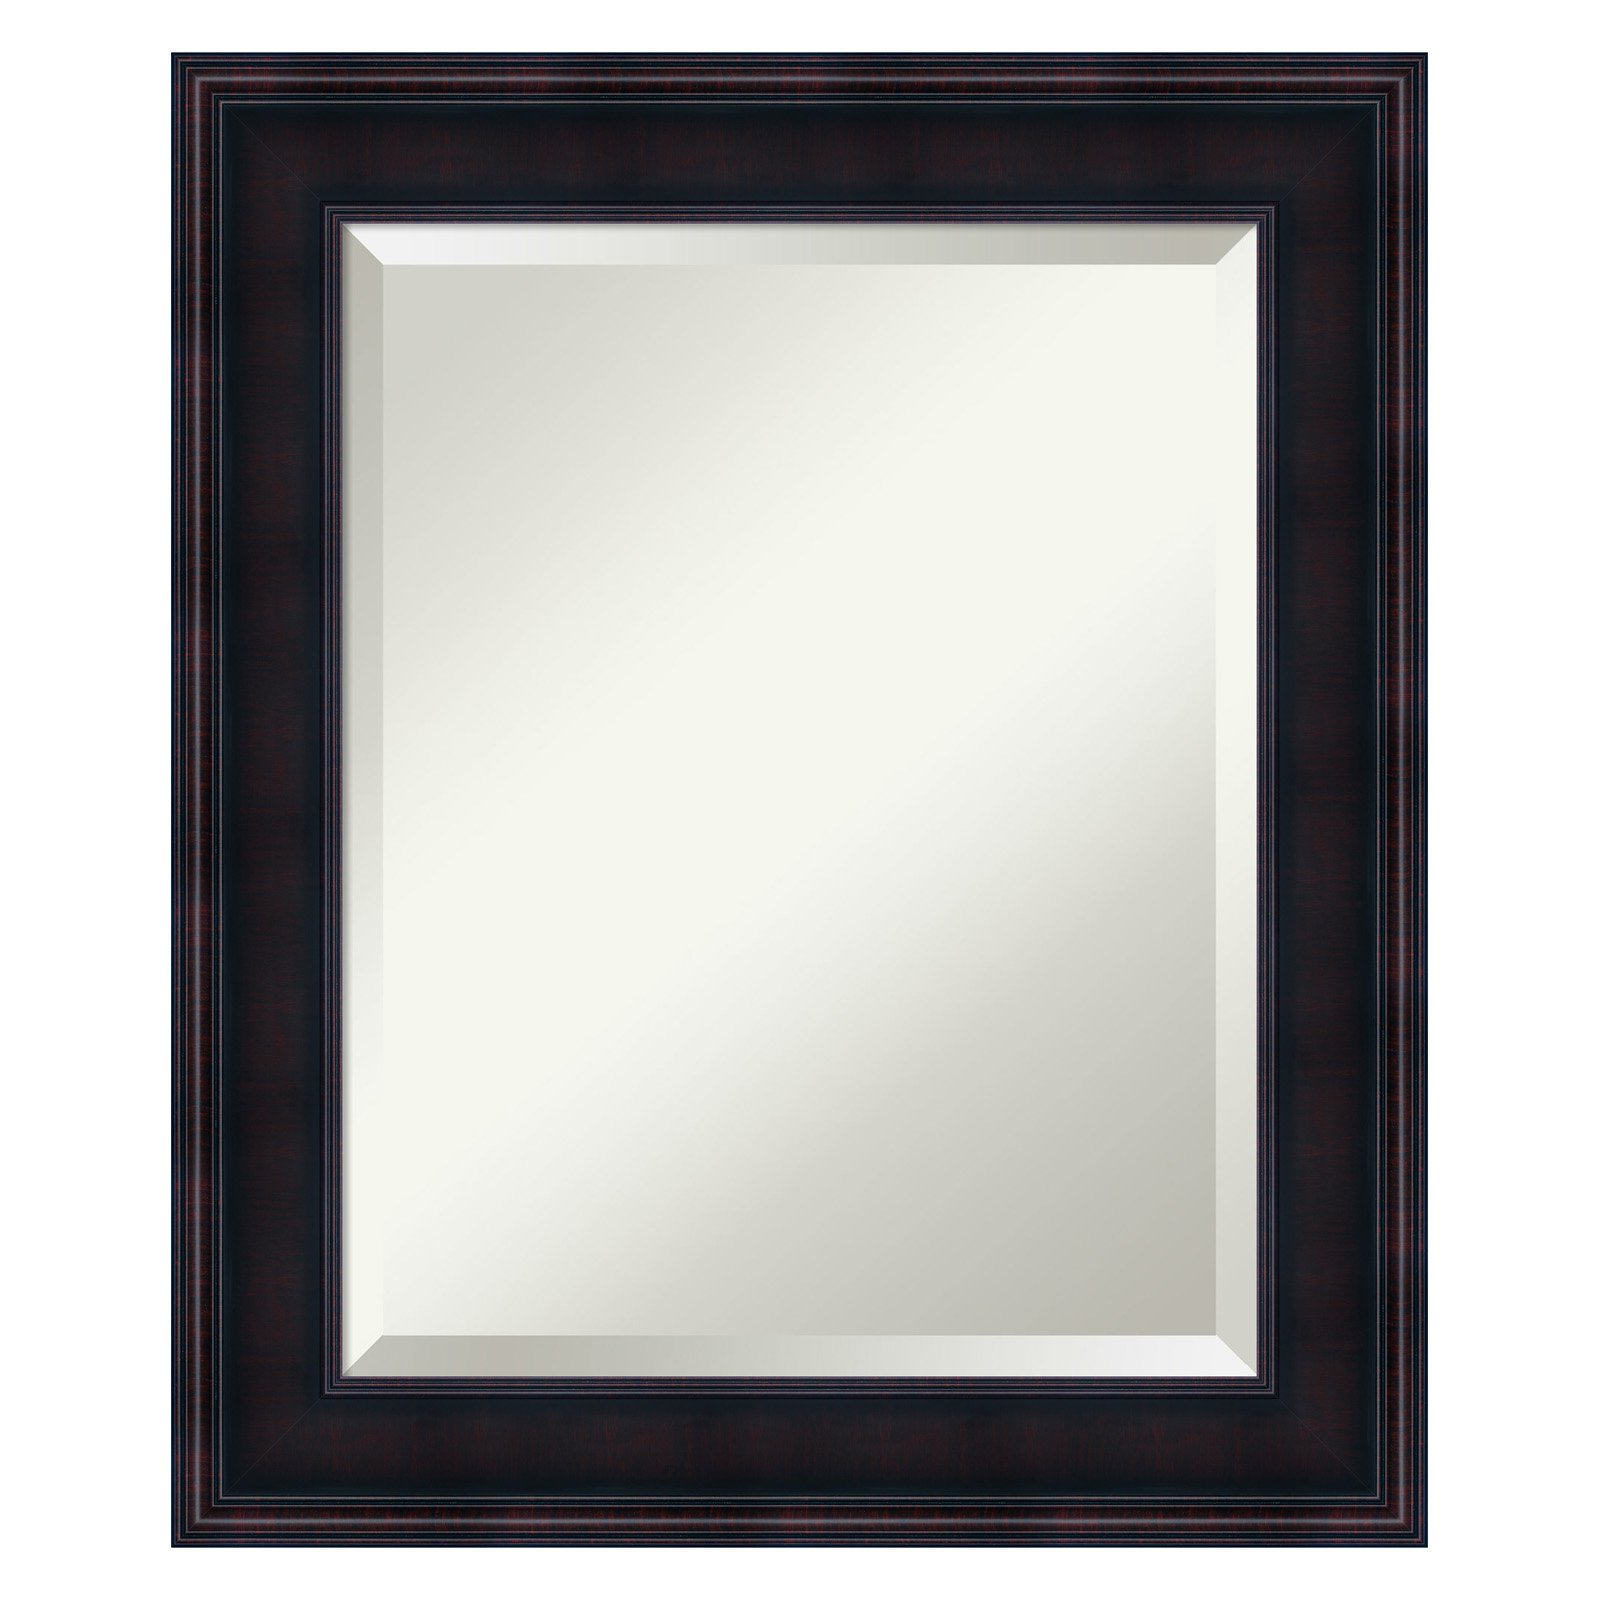 Amanti Art Annatto Bathroom Mirror by Amanti Art